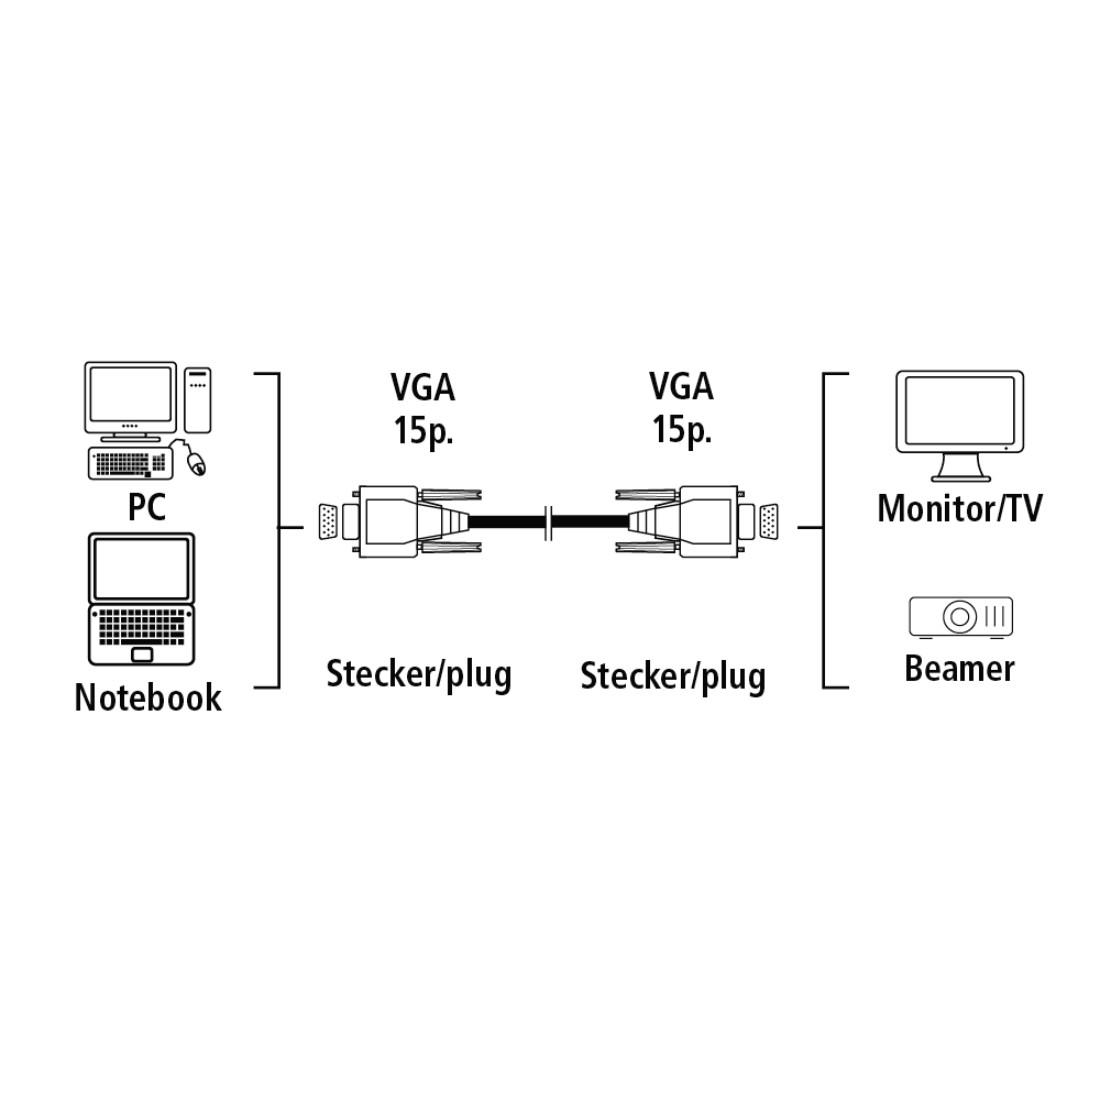 00020185 Hama Vga Cable 180 M 10 Pieces De Schematic Stx High Res Line Drawing